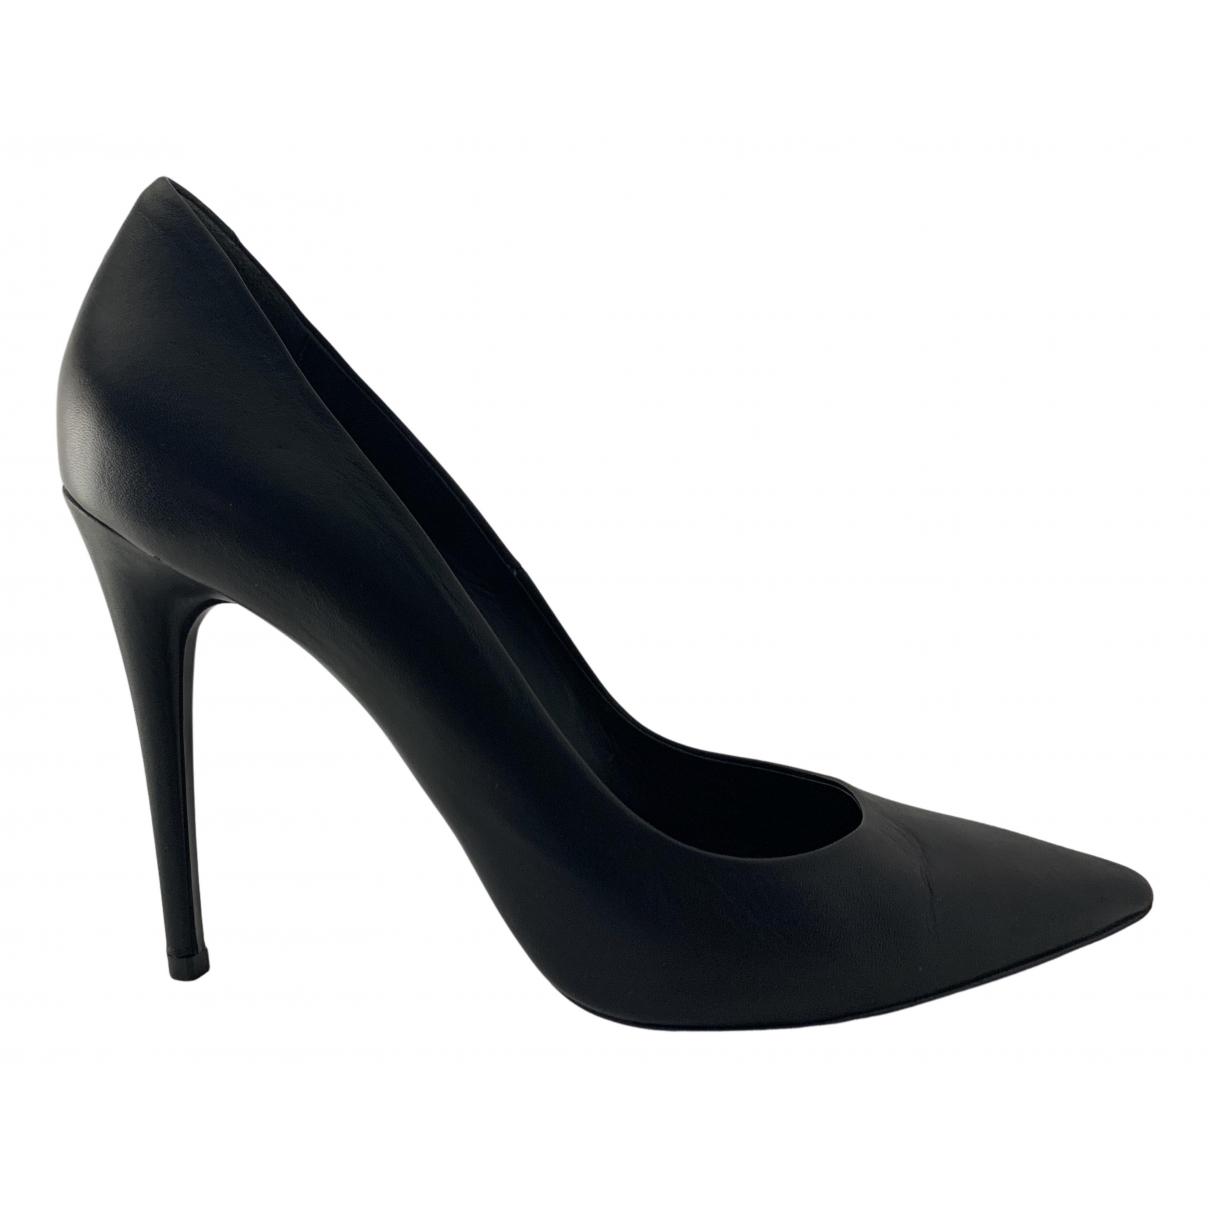 Alexander Wang N Black Leather Heels for Women 38 EU